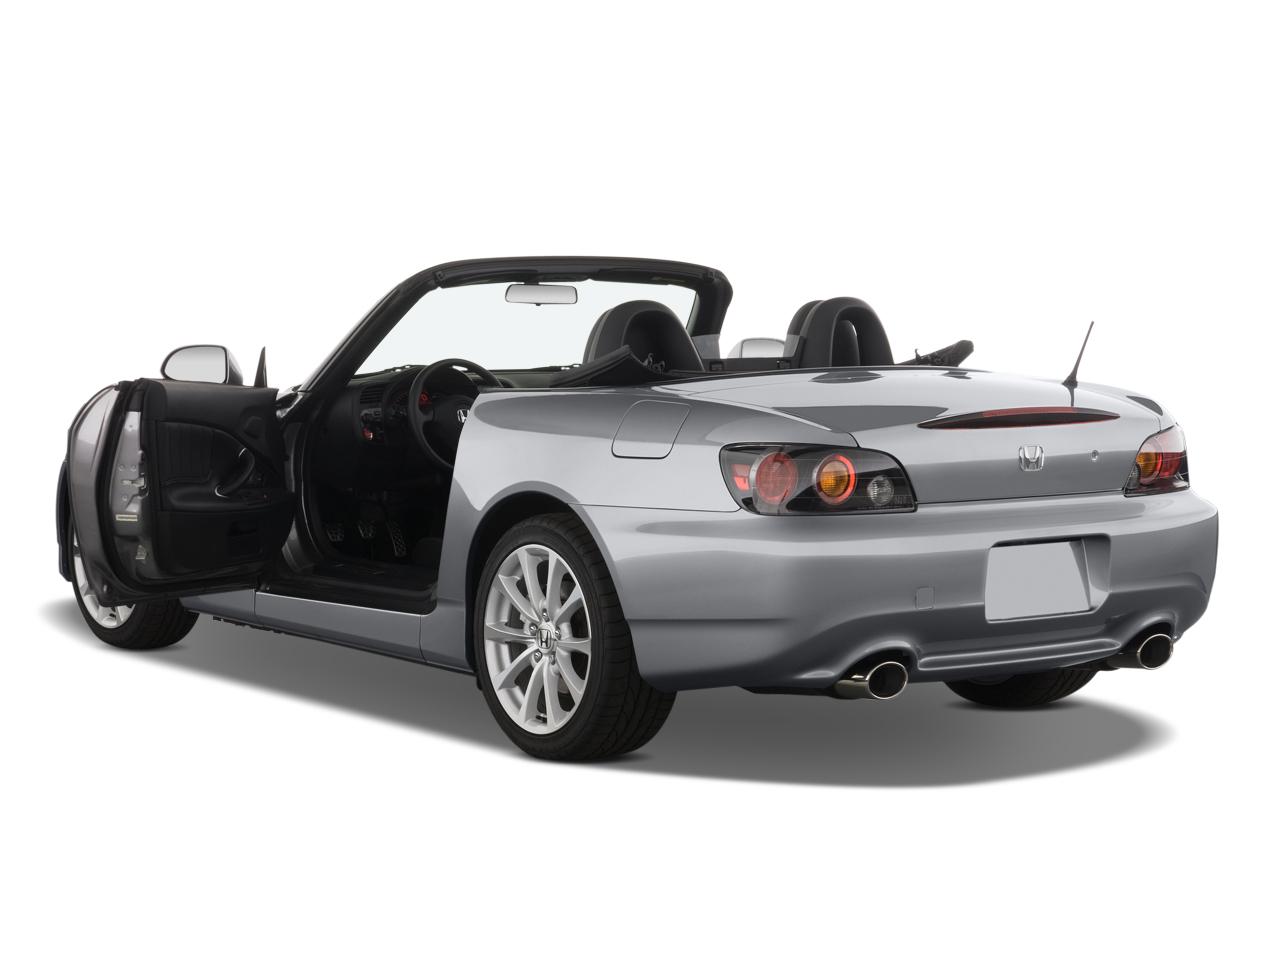 2009 honda s2000 cr honda roadster sport coupe review automobile magazine. Black Bedroom Furniture Sets. Home Design Ideas